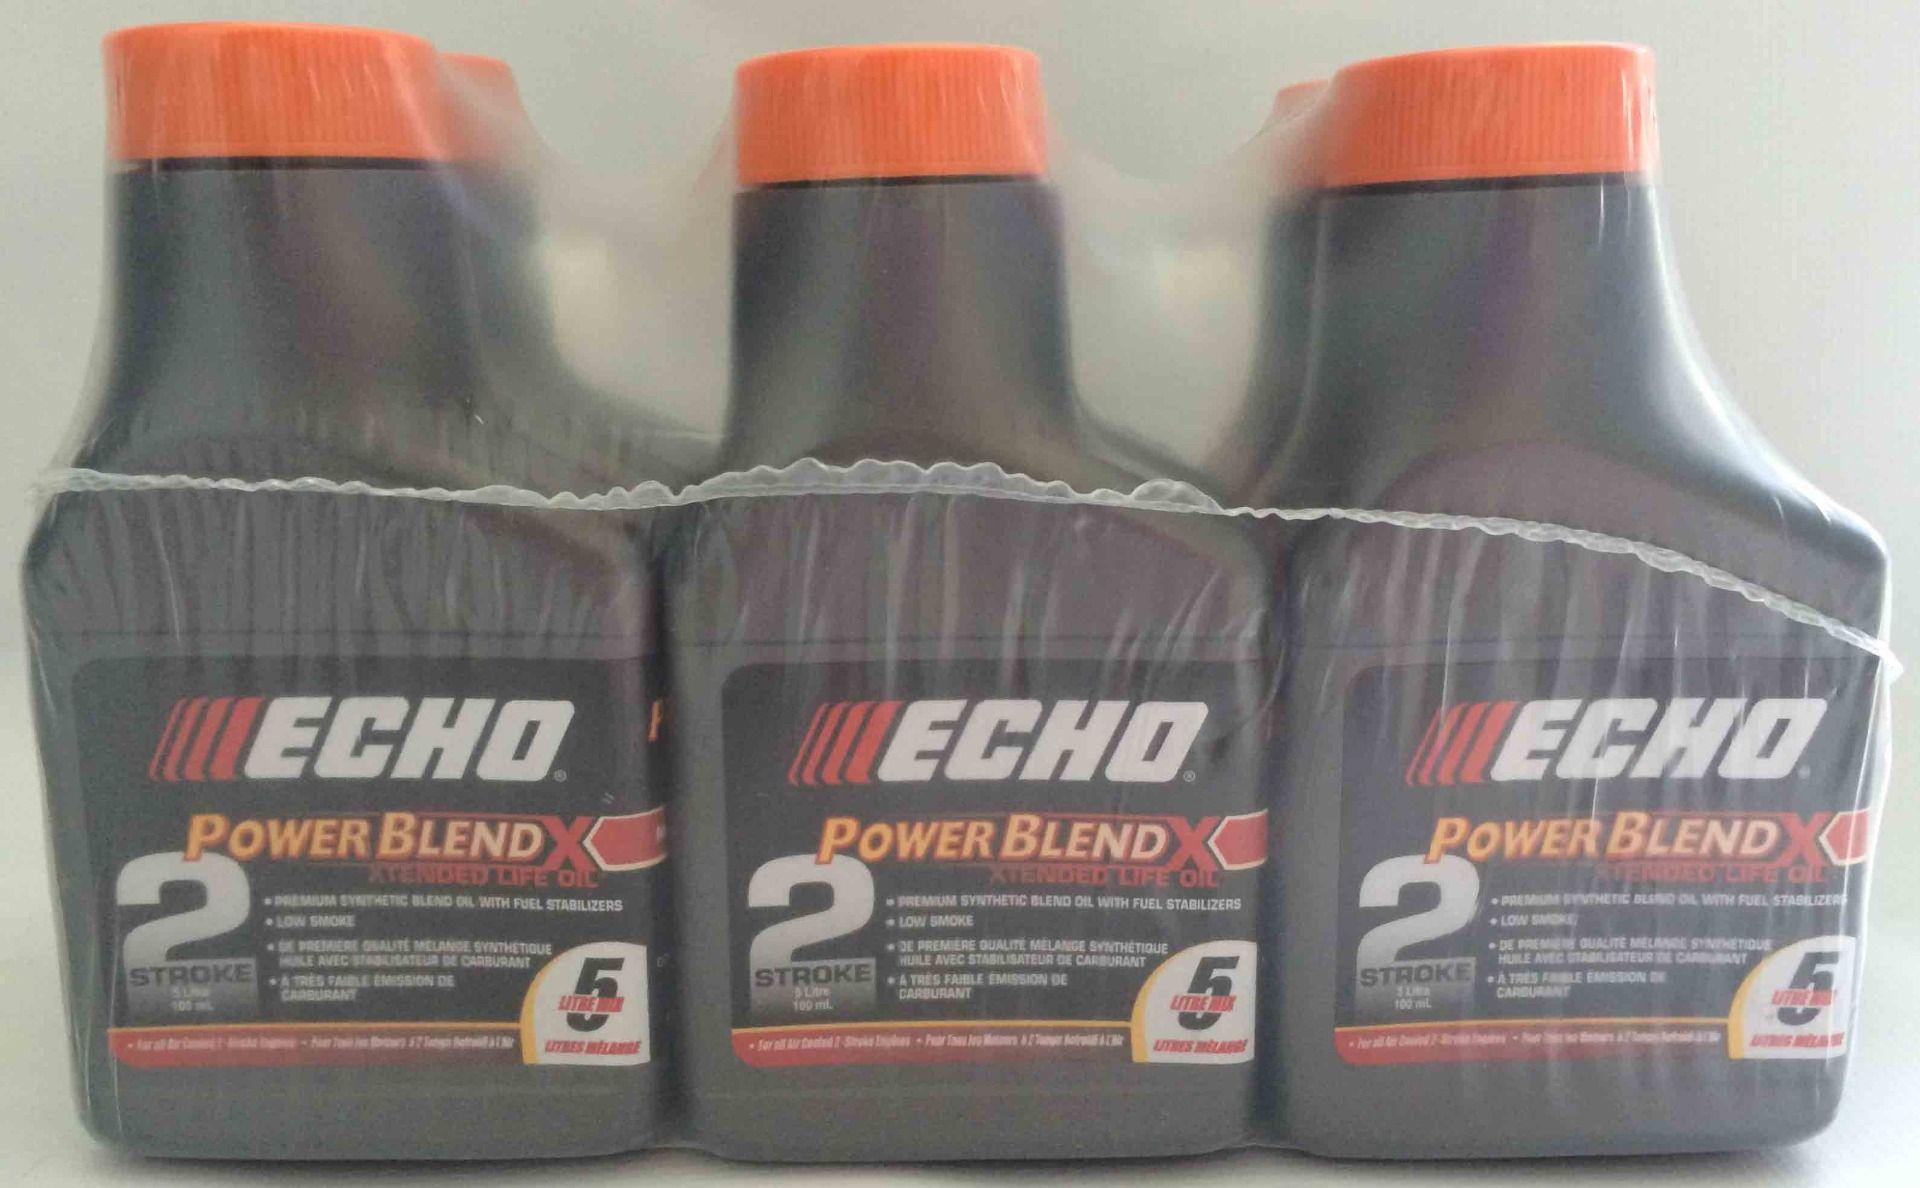 ECHO Premium Synthetic Powerblend oil in 100mL bottles x 6